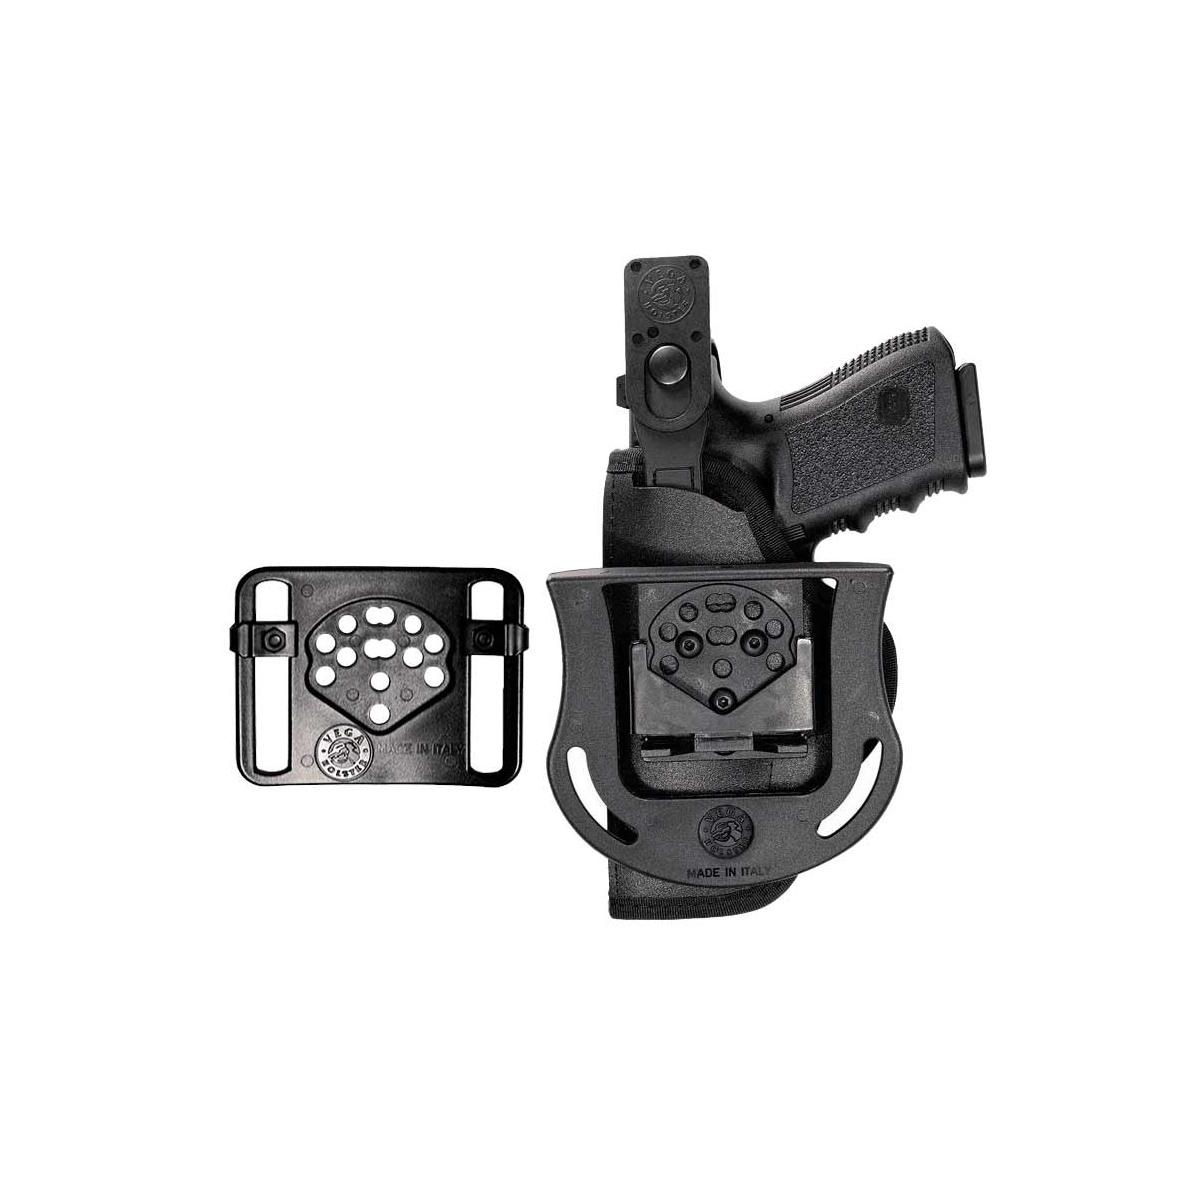 Sig Sauer Holster Belt Loop Adapter Black M2100 HOL-BA-BLK NIB 798681412150